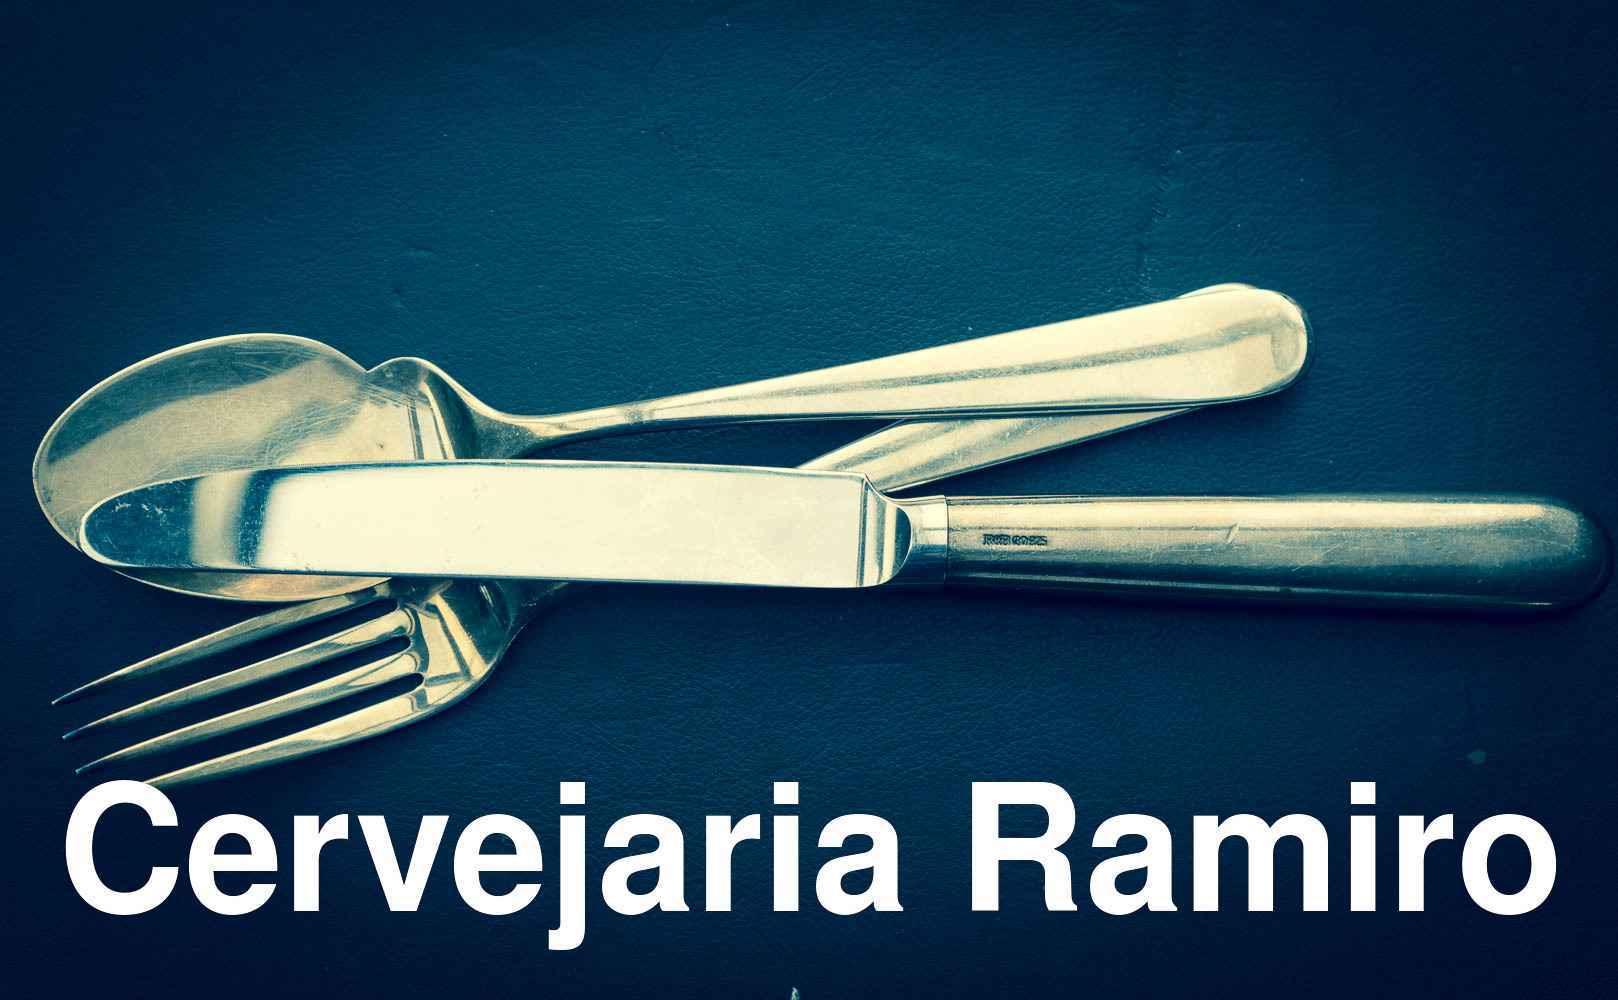 Go to Restaurantkritik: Cervejaria Ramiro in Avenida Almirante Reis 1-H, 1150-007 Lissabon, Portugal